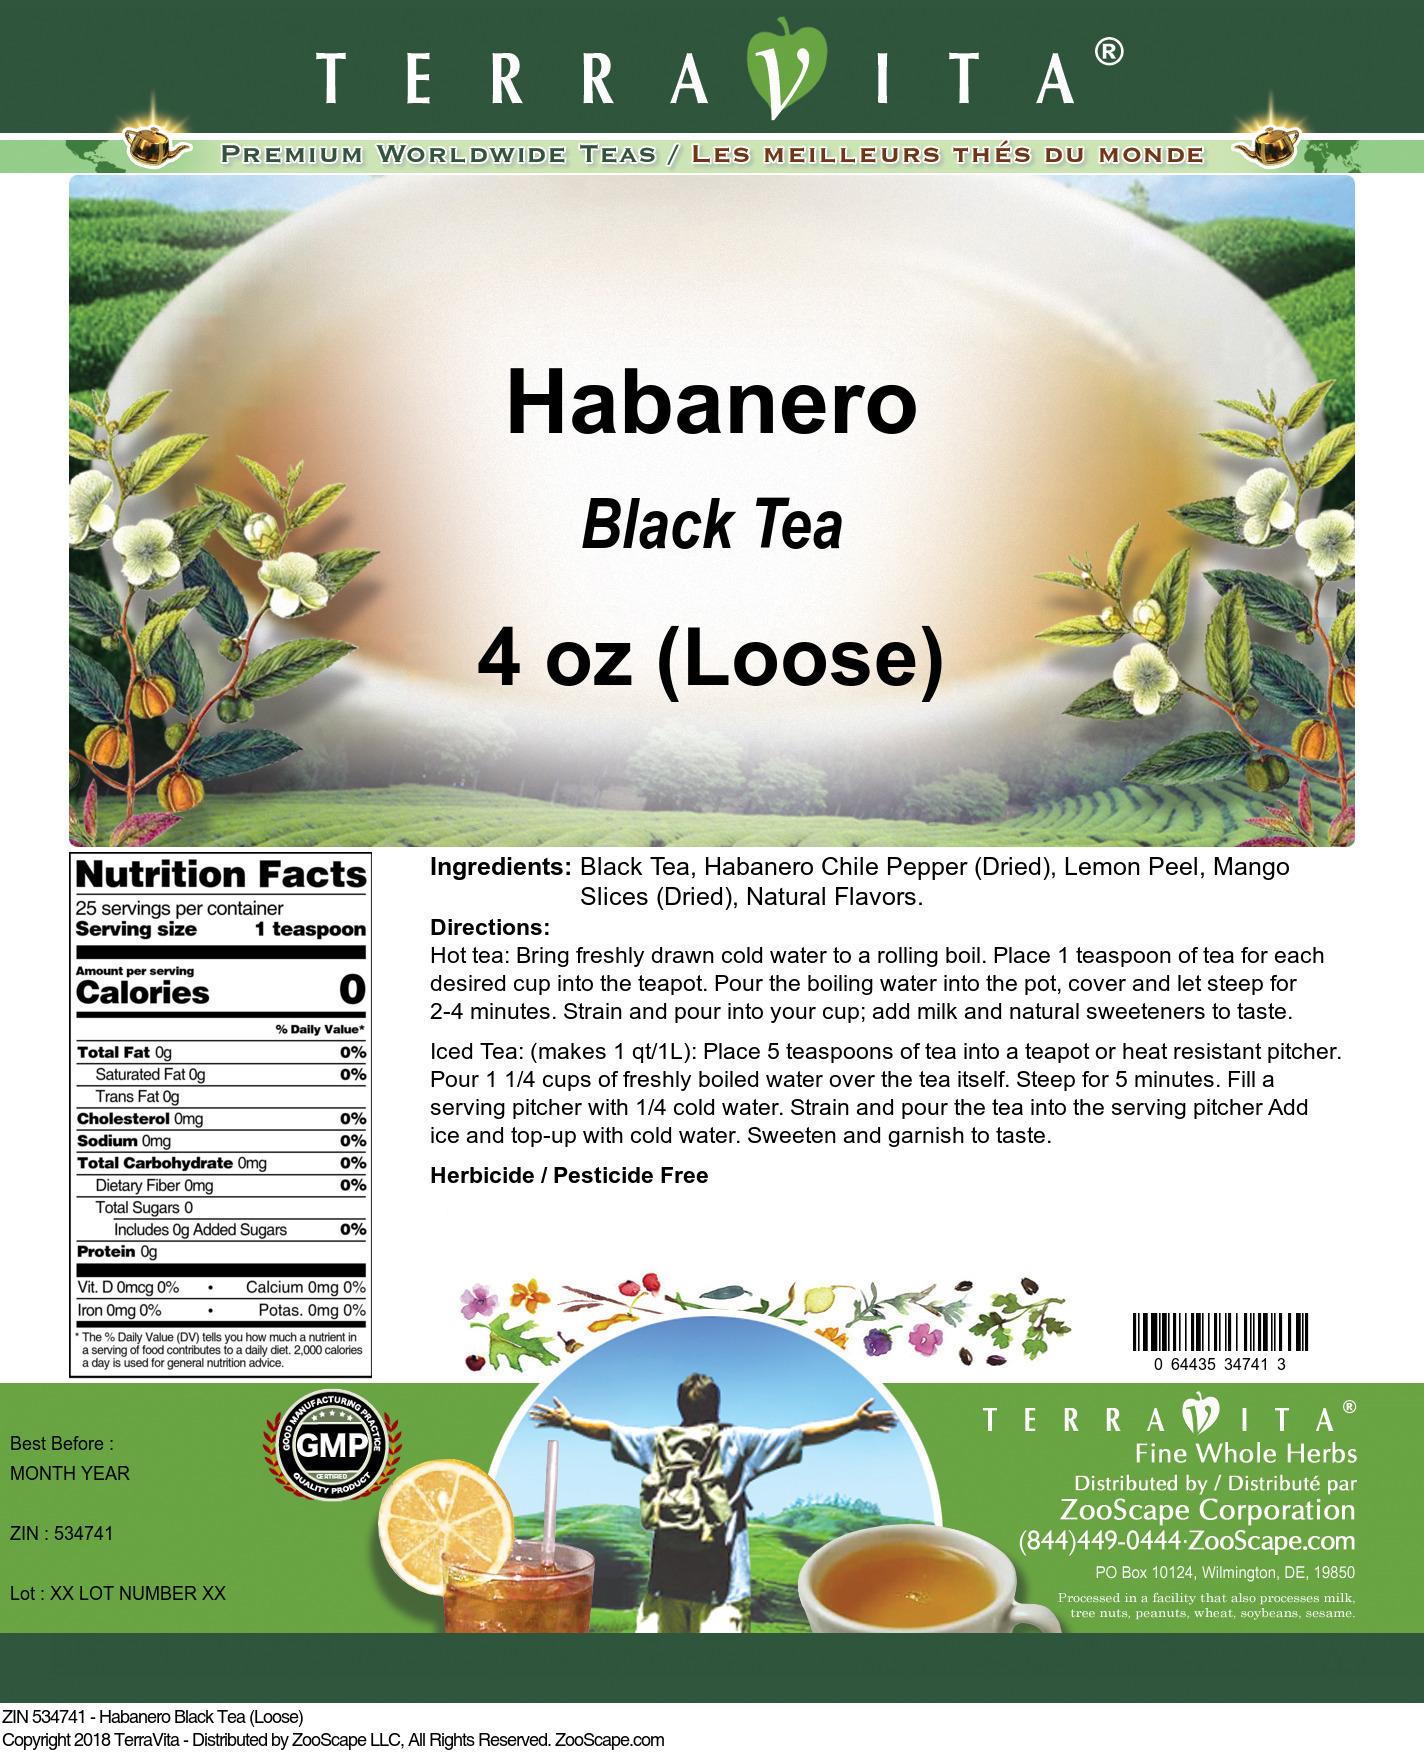 Habanero Black Tea (Loose)